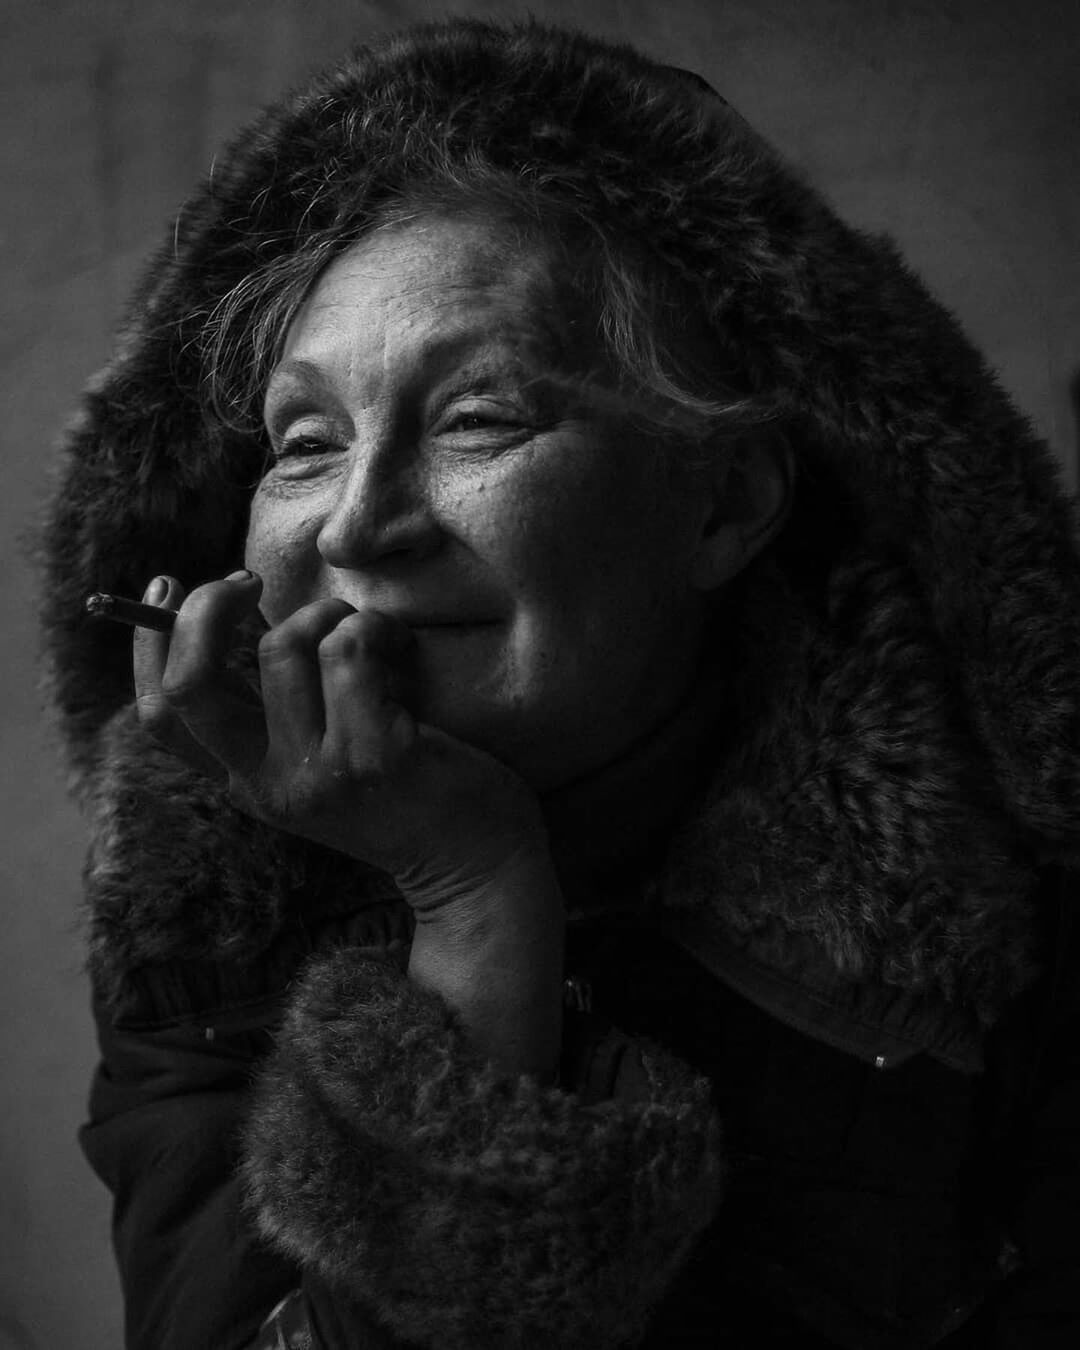 фотограф: Влад Олейник